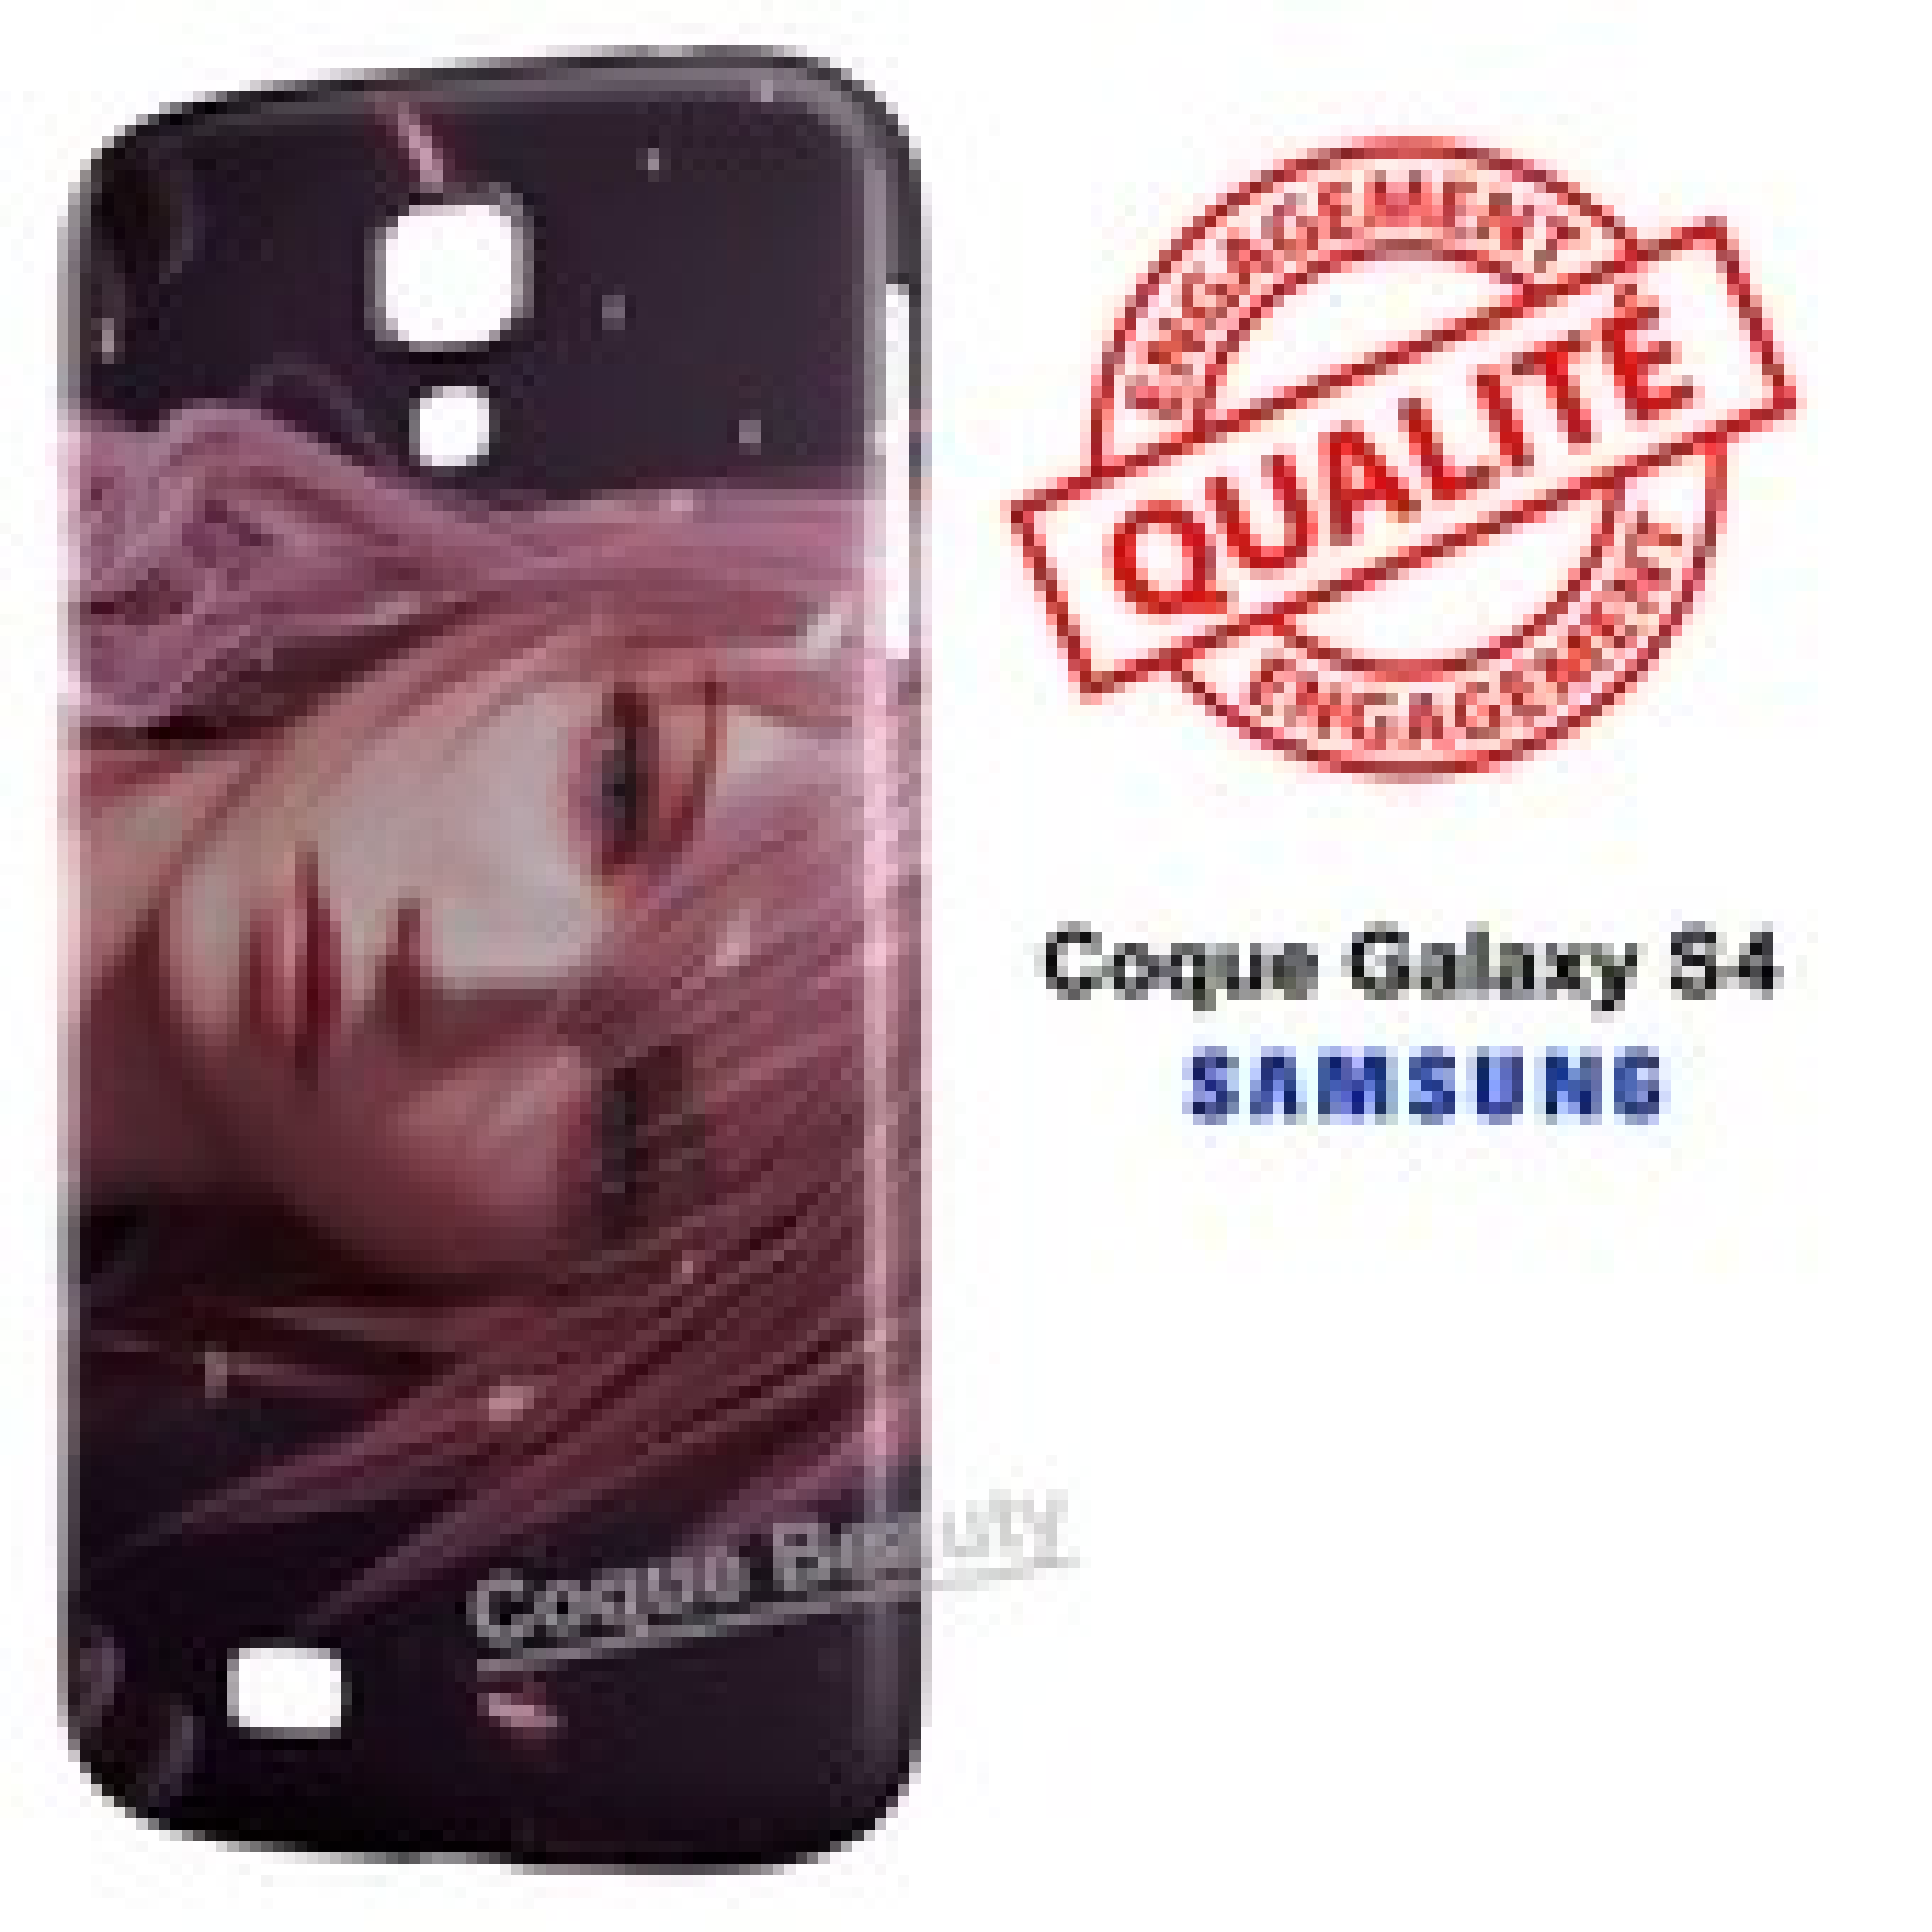 Coque Galaxy S4 Lightning - Final Fantasy Xiii